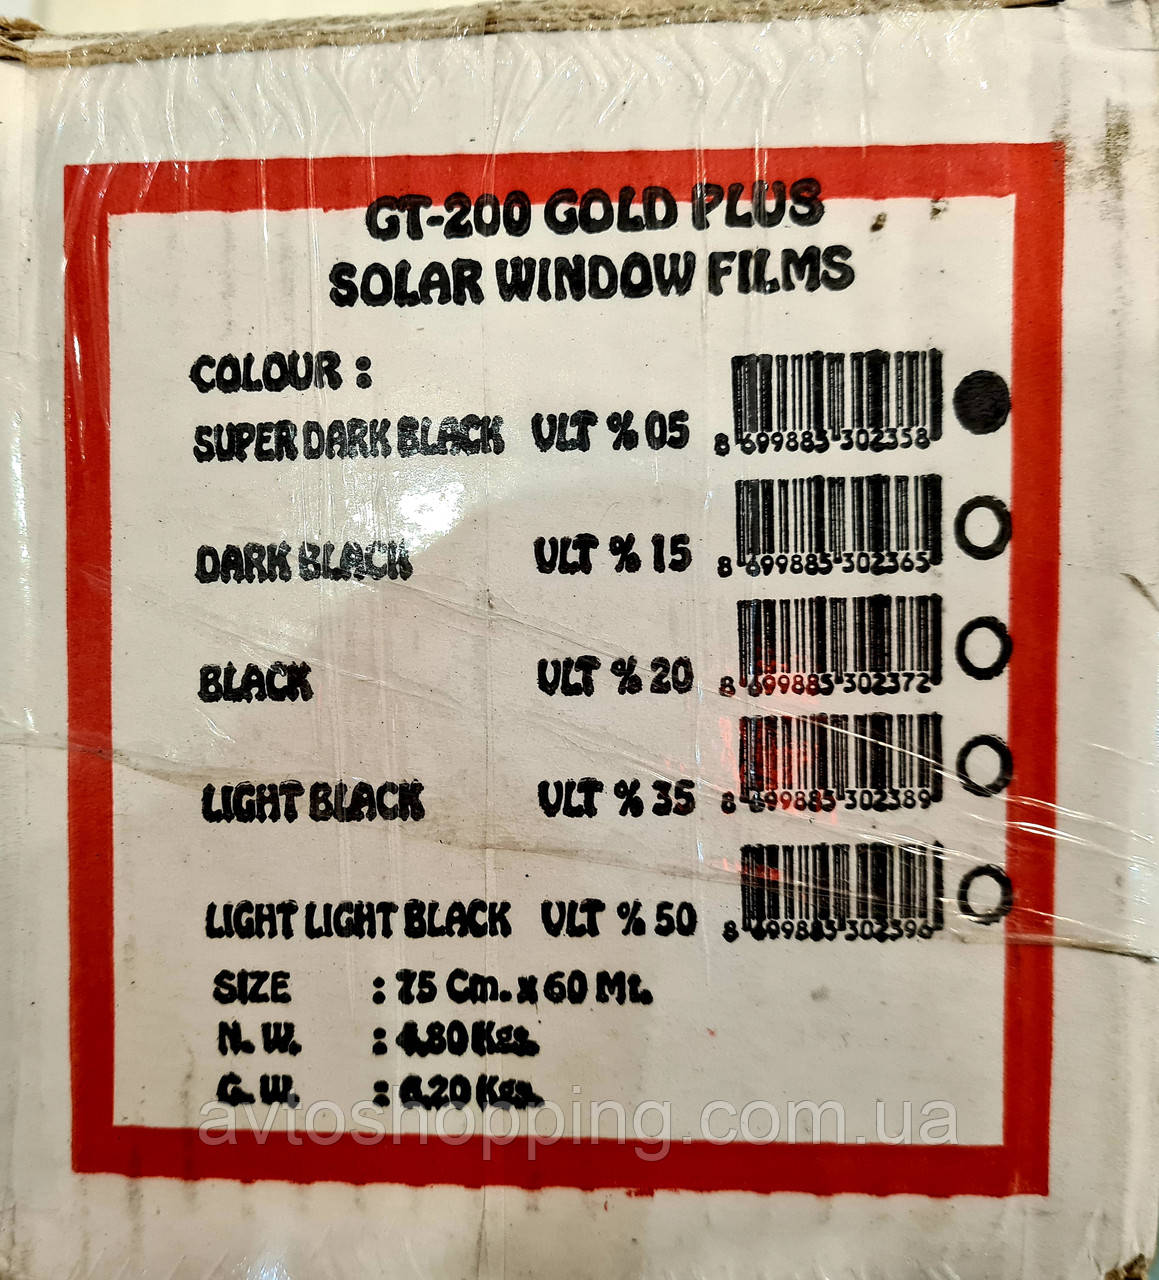 Пленка Тонировочная Premium 200 мкр Guard 75 cм 3 метра ,SDBK 5% пленка для тонировки стекол. Антицарапка